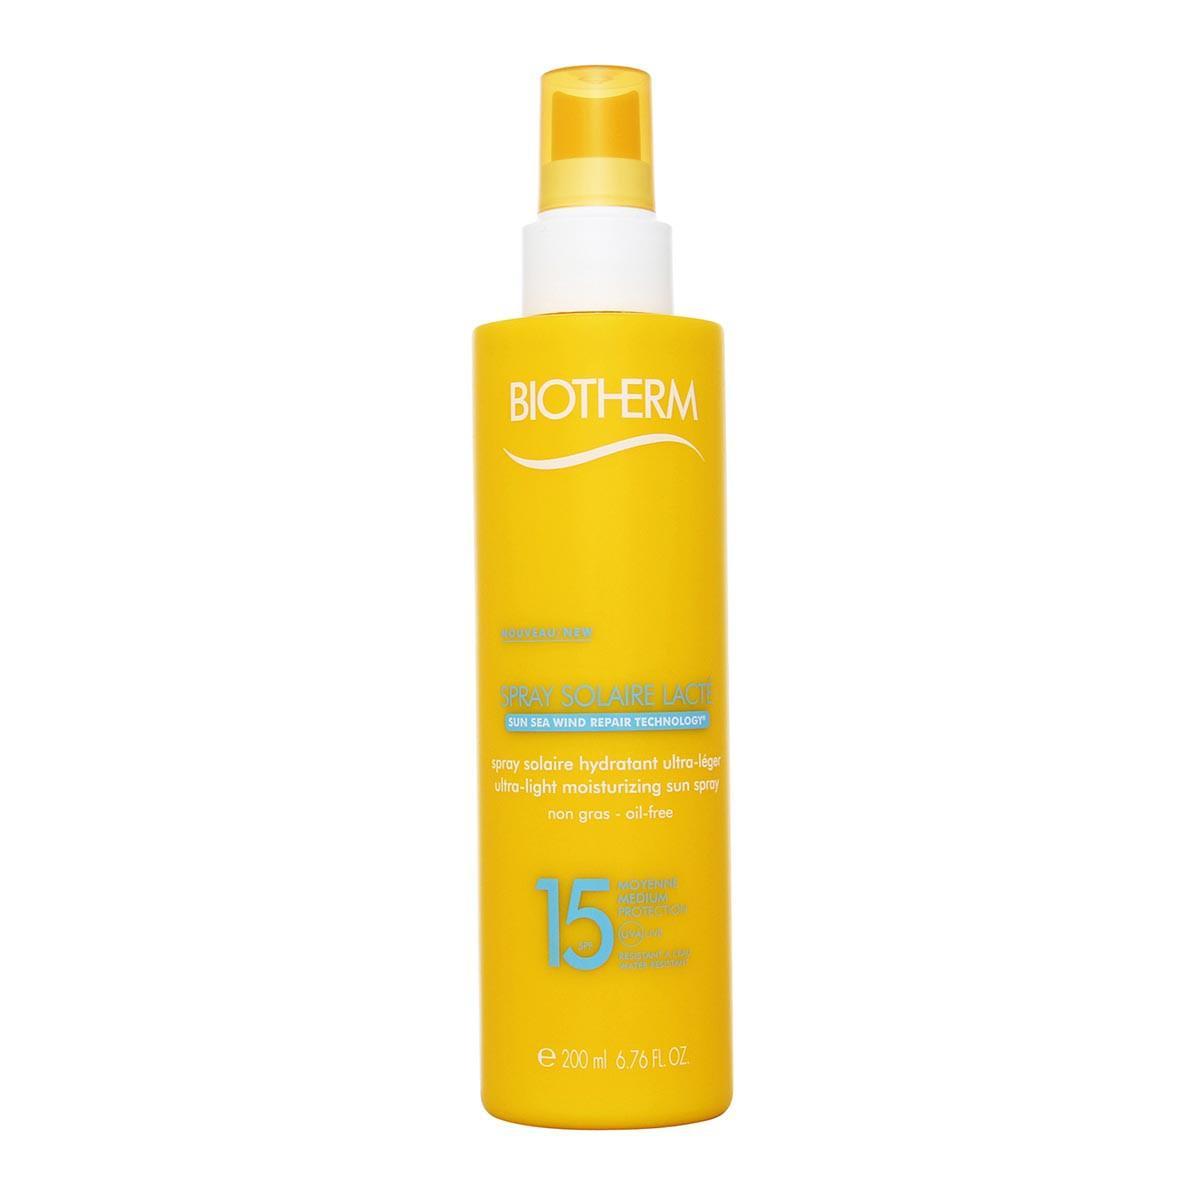 Biotherm-fragrances Spray Solaire Lacte Spf50 200ml